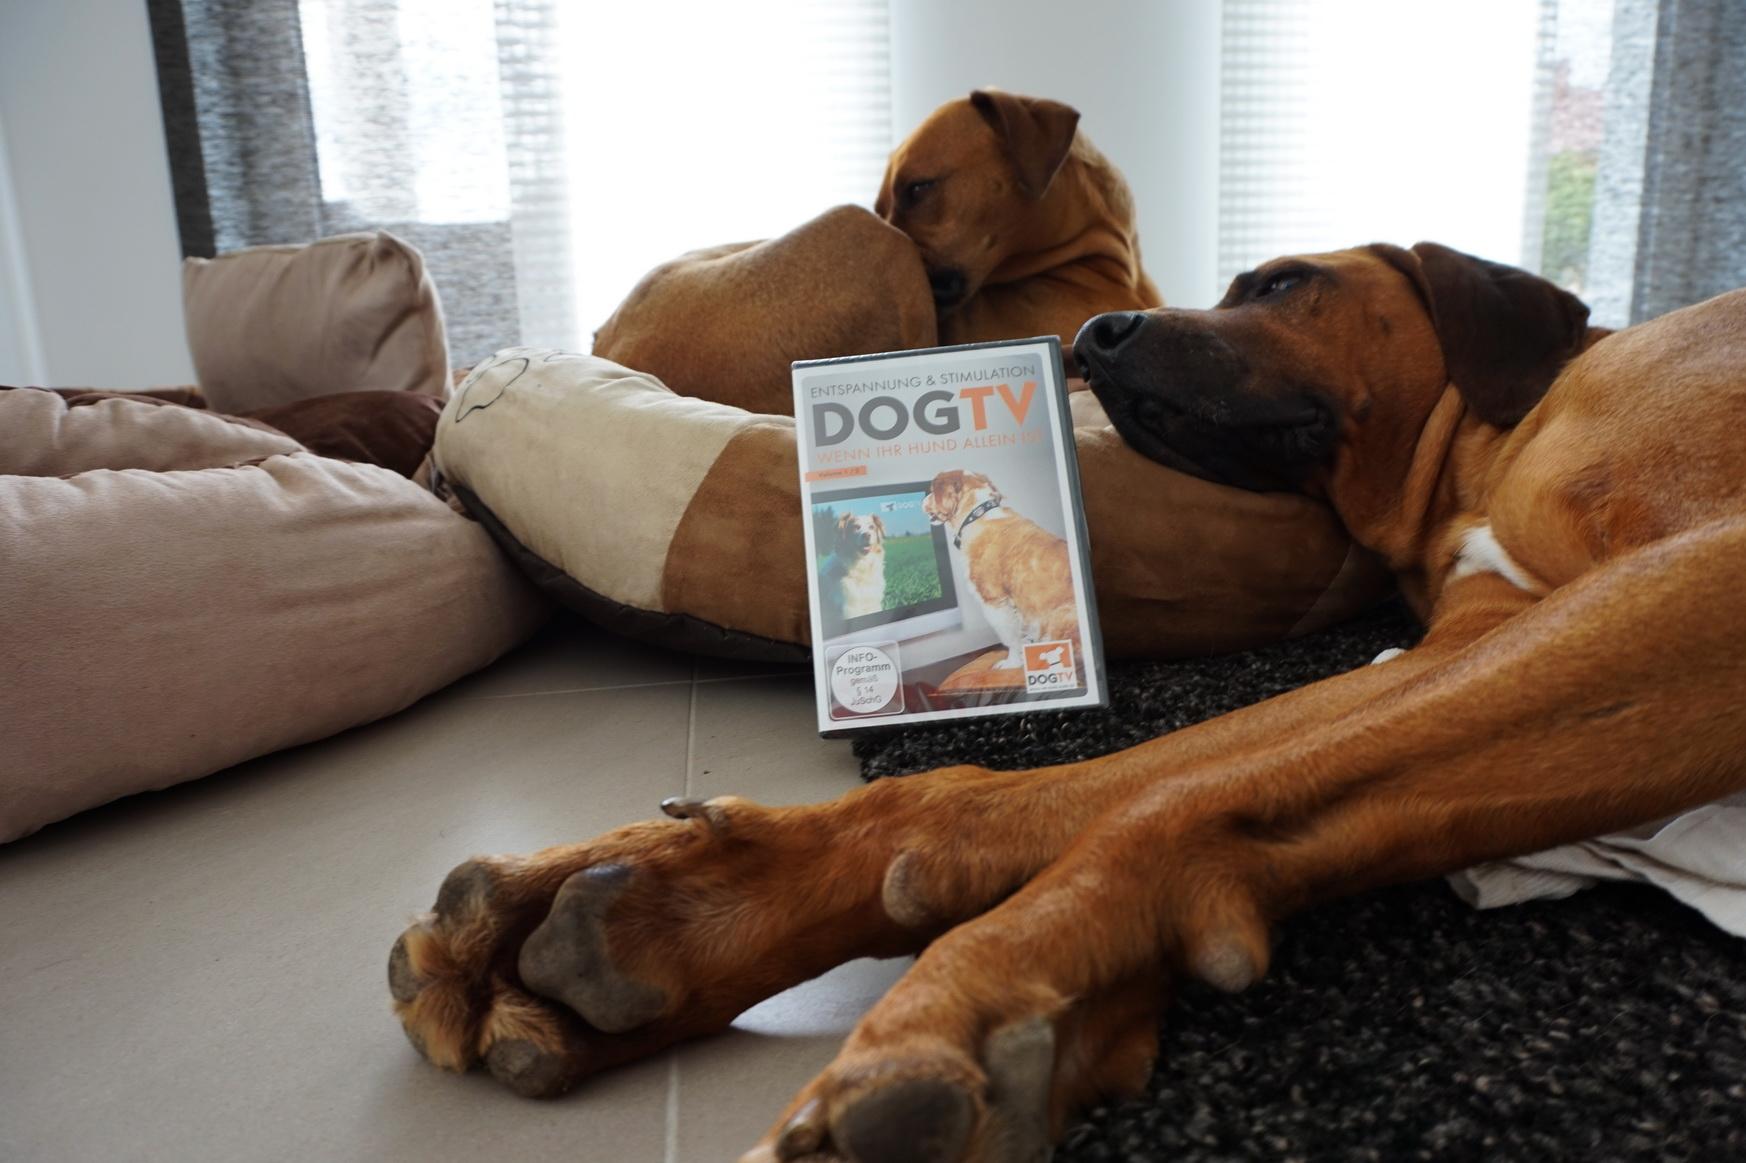 0609 DogTV 2